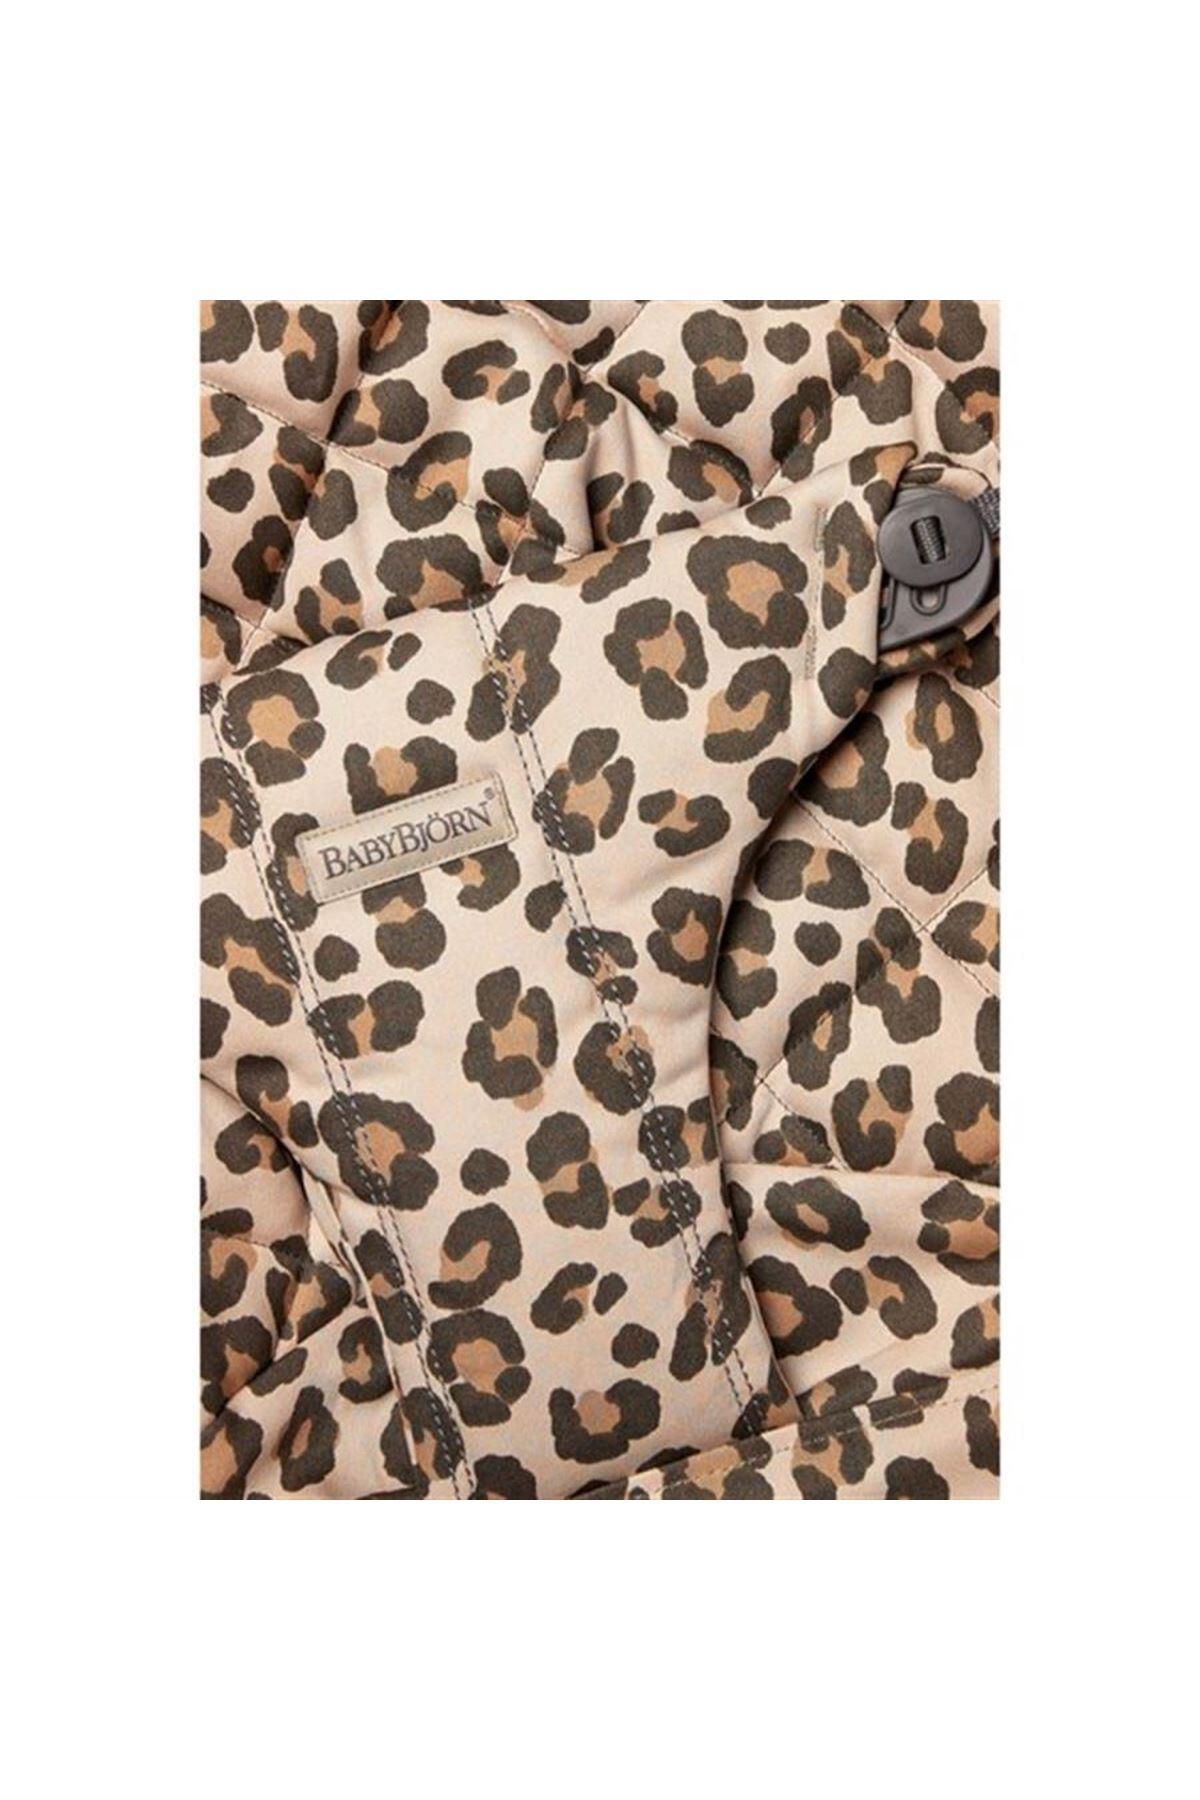 BabyBjörn Bliss Ana Kucağı Cotton / Beige Leopard